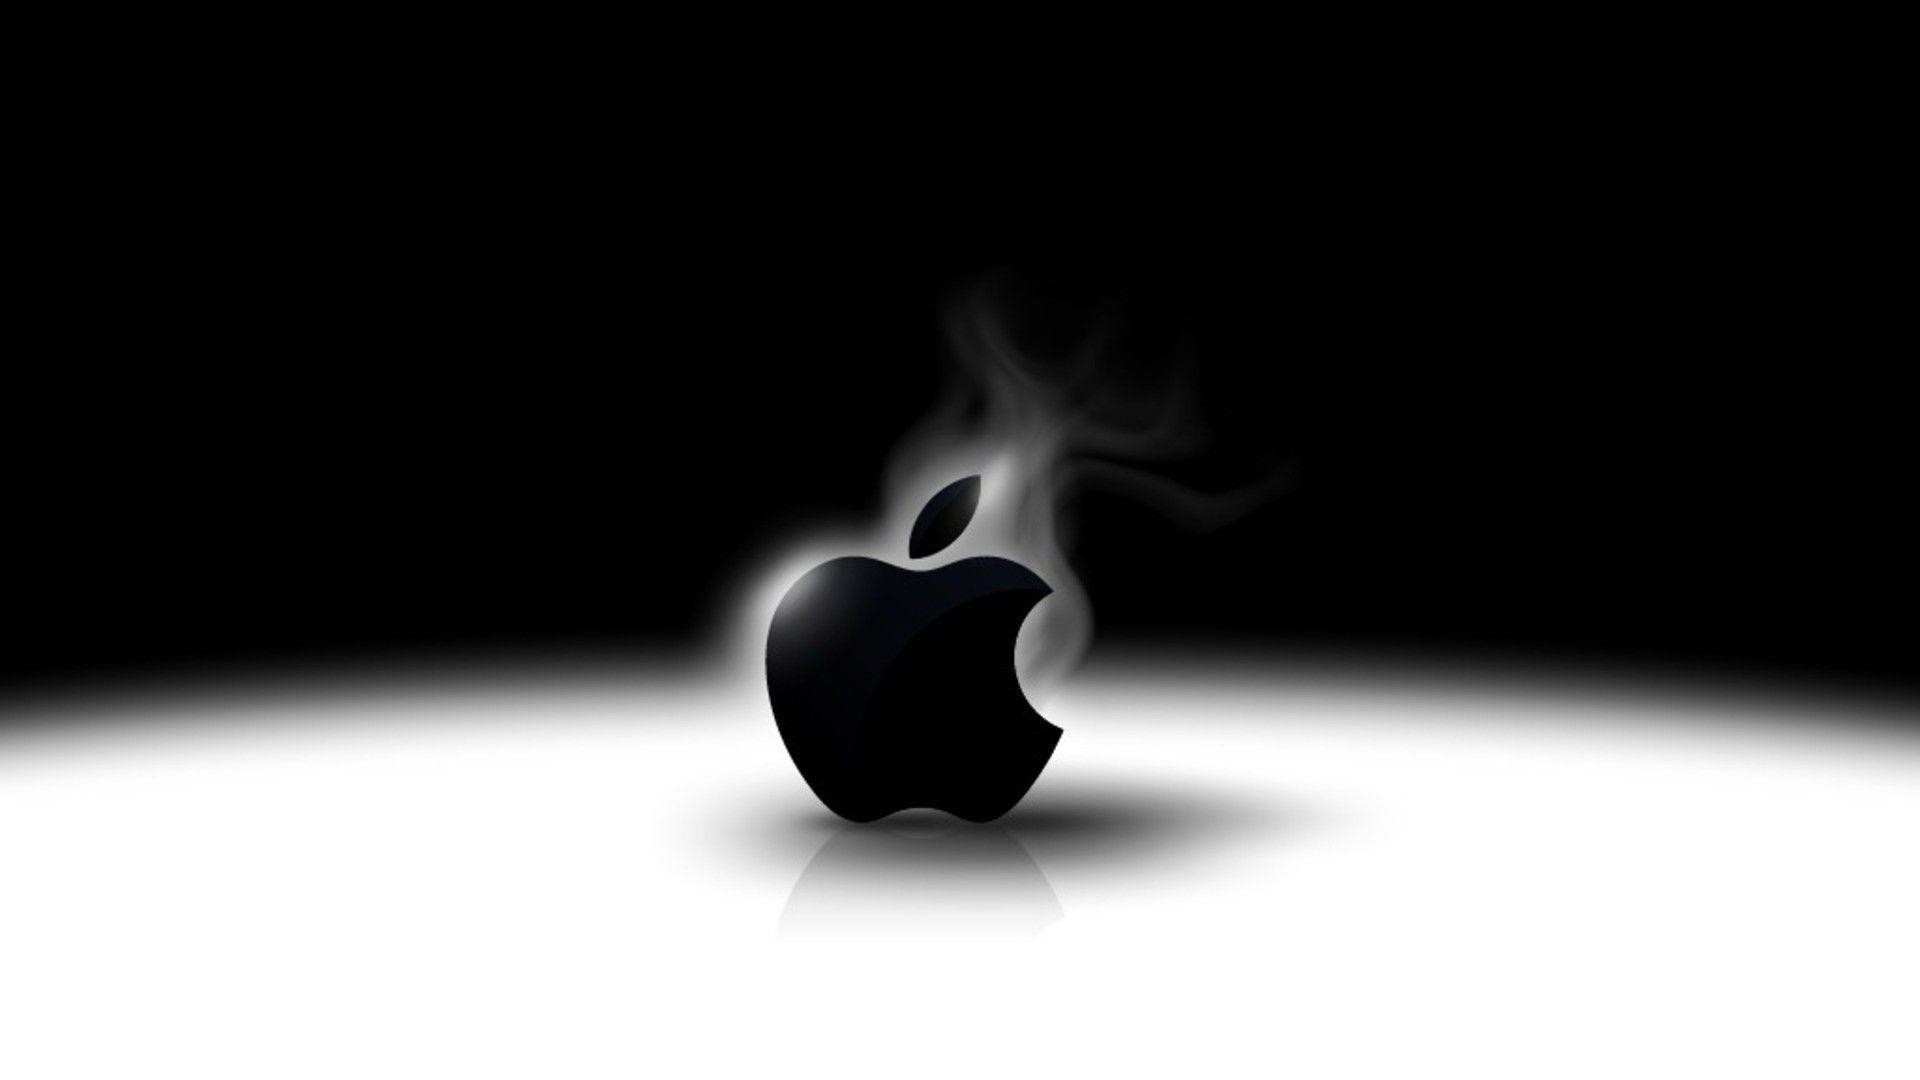 <b>Black</b> Glossy <b>Apple Logo</